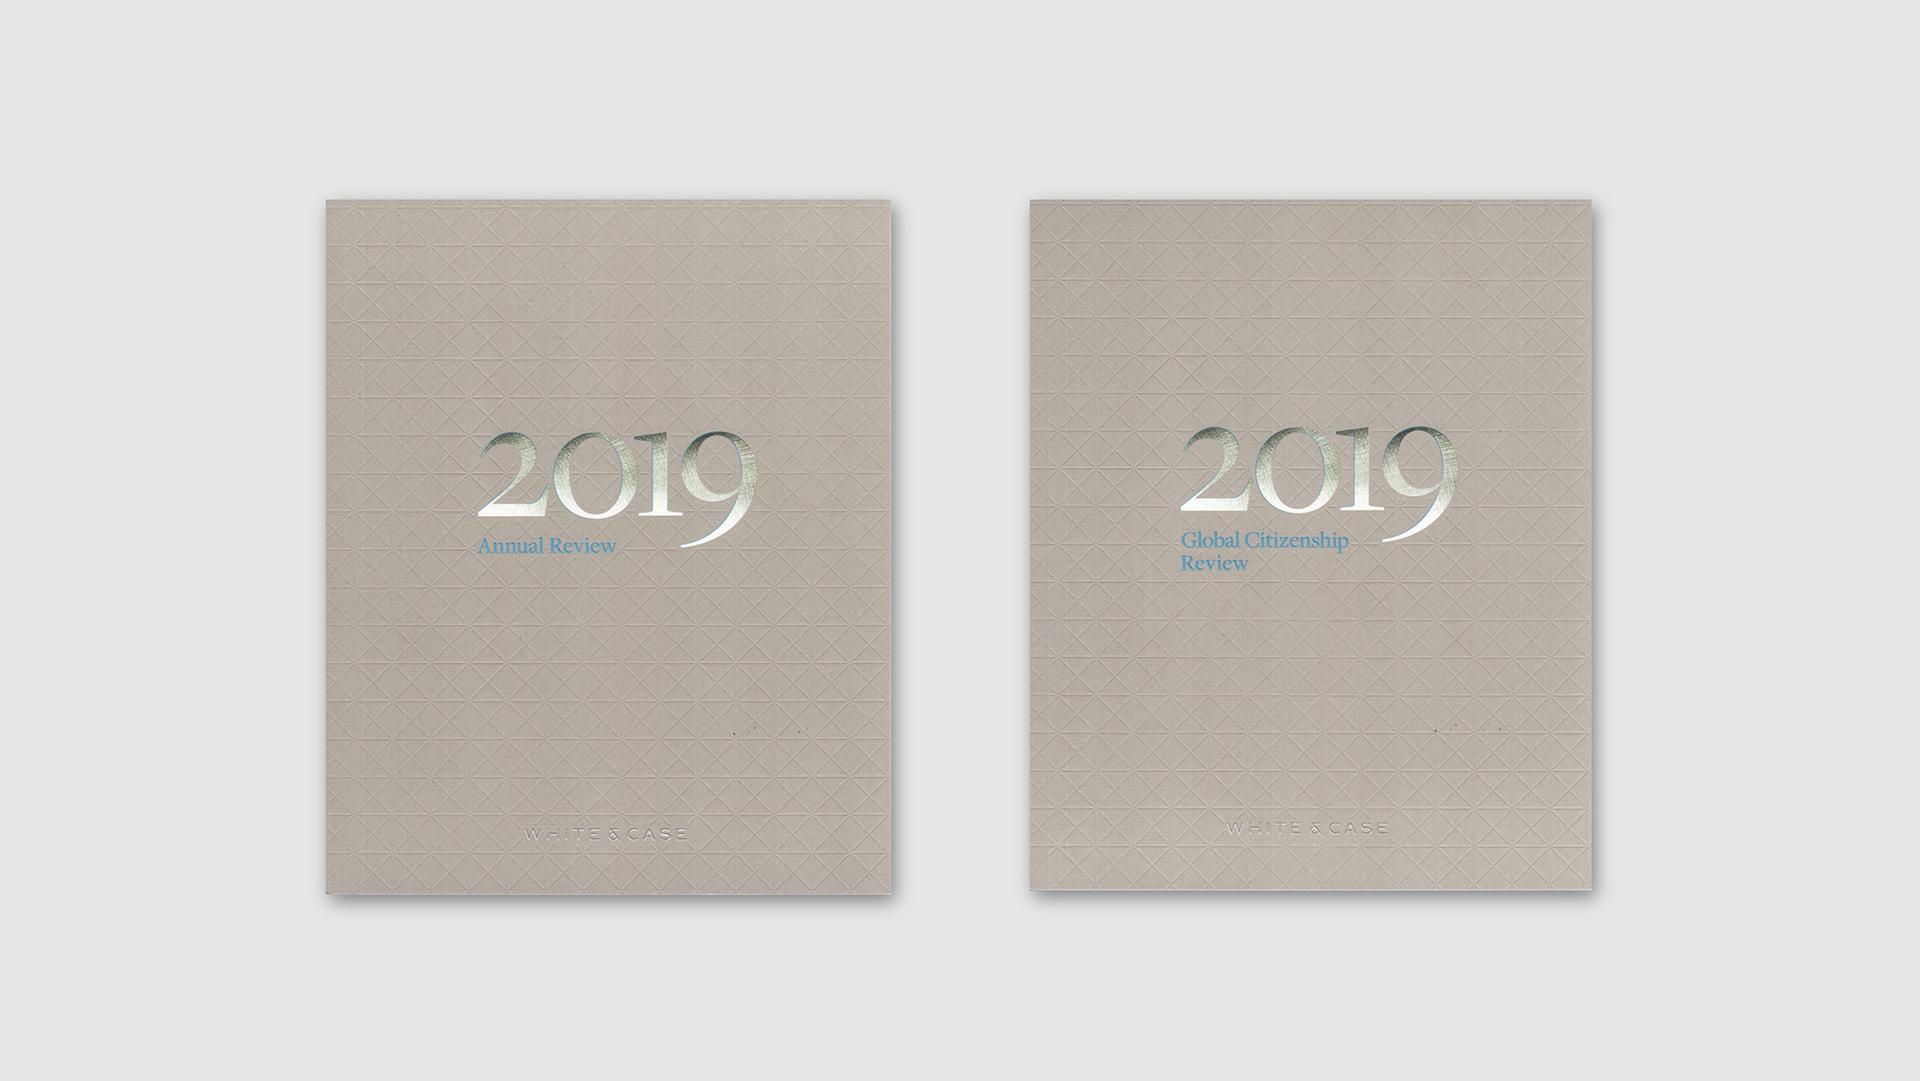 Creative Annual Report Design: White & Case - PaperSpecs